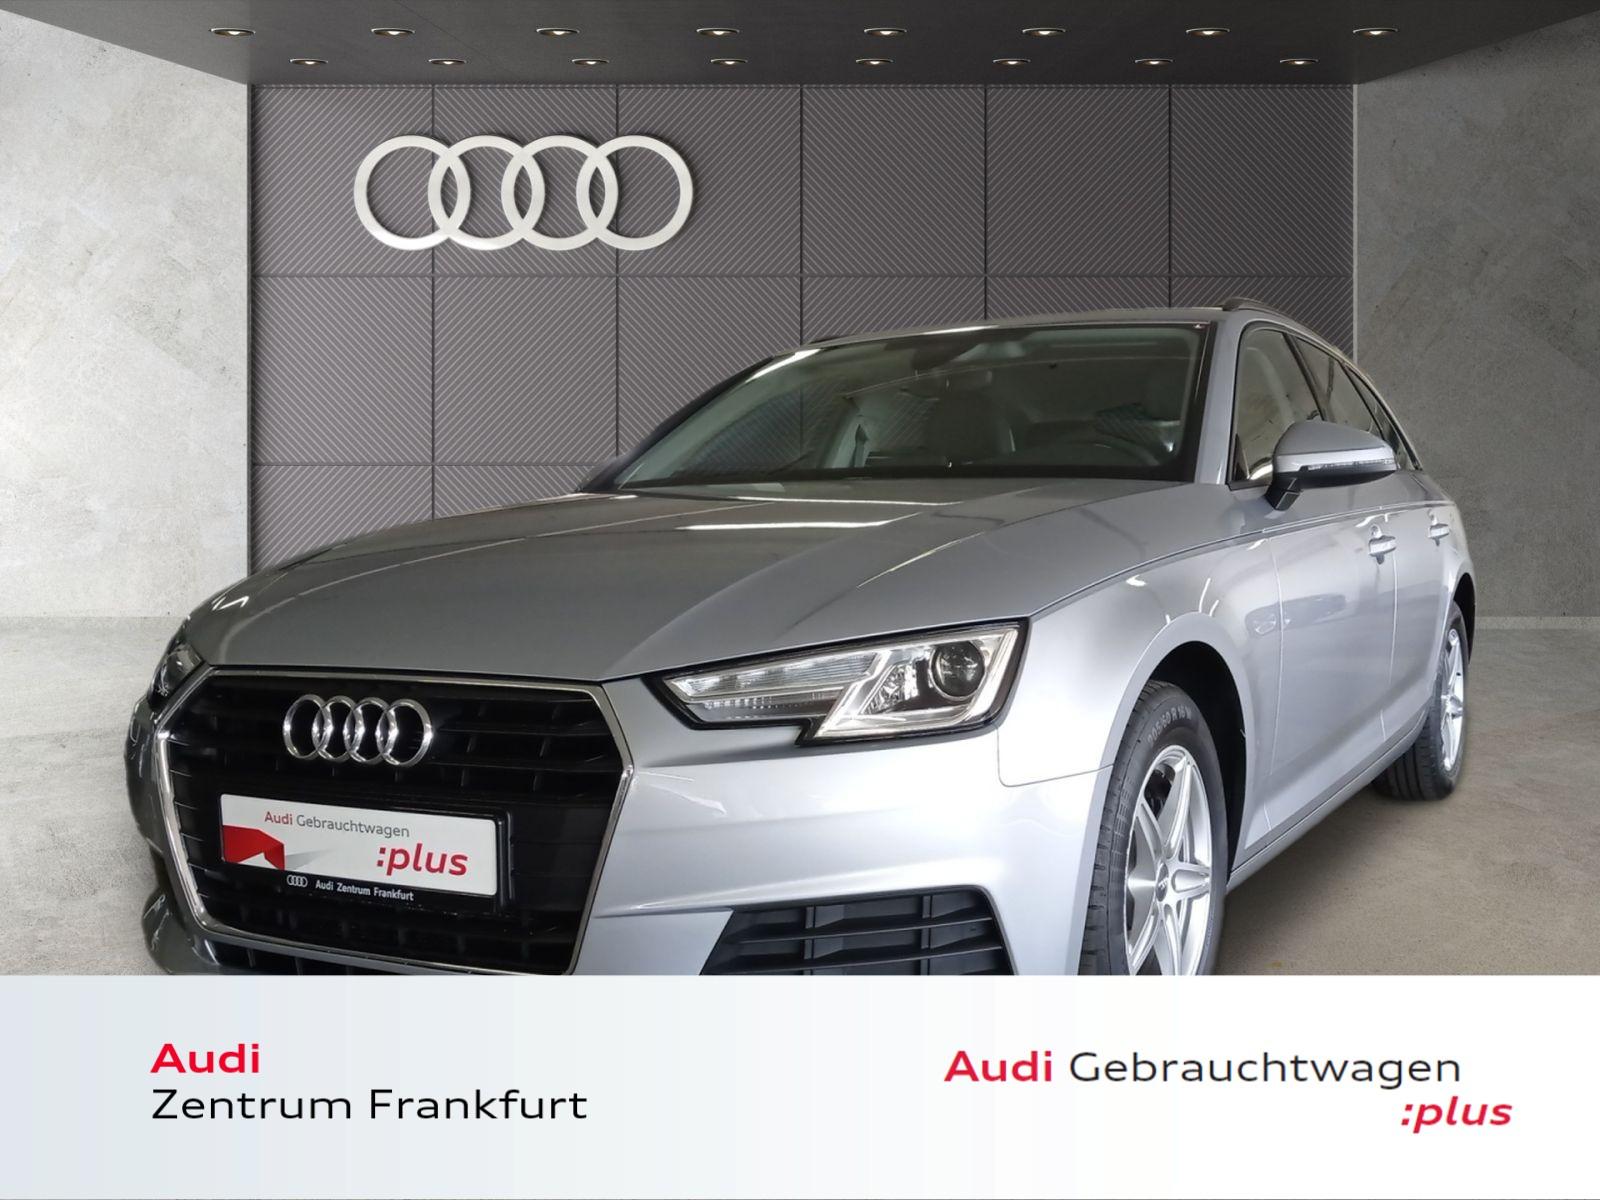 Audi A4 Avant 2.0 TDI Xenon Navi PDC Tempomat, Jahr 2018, Diesel